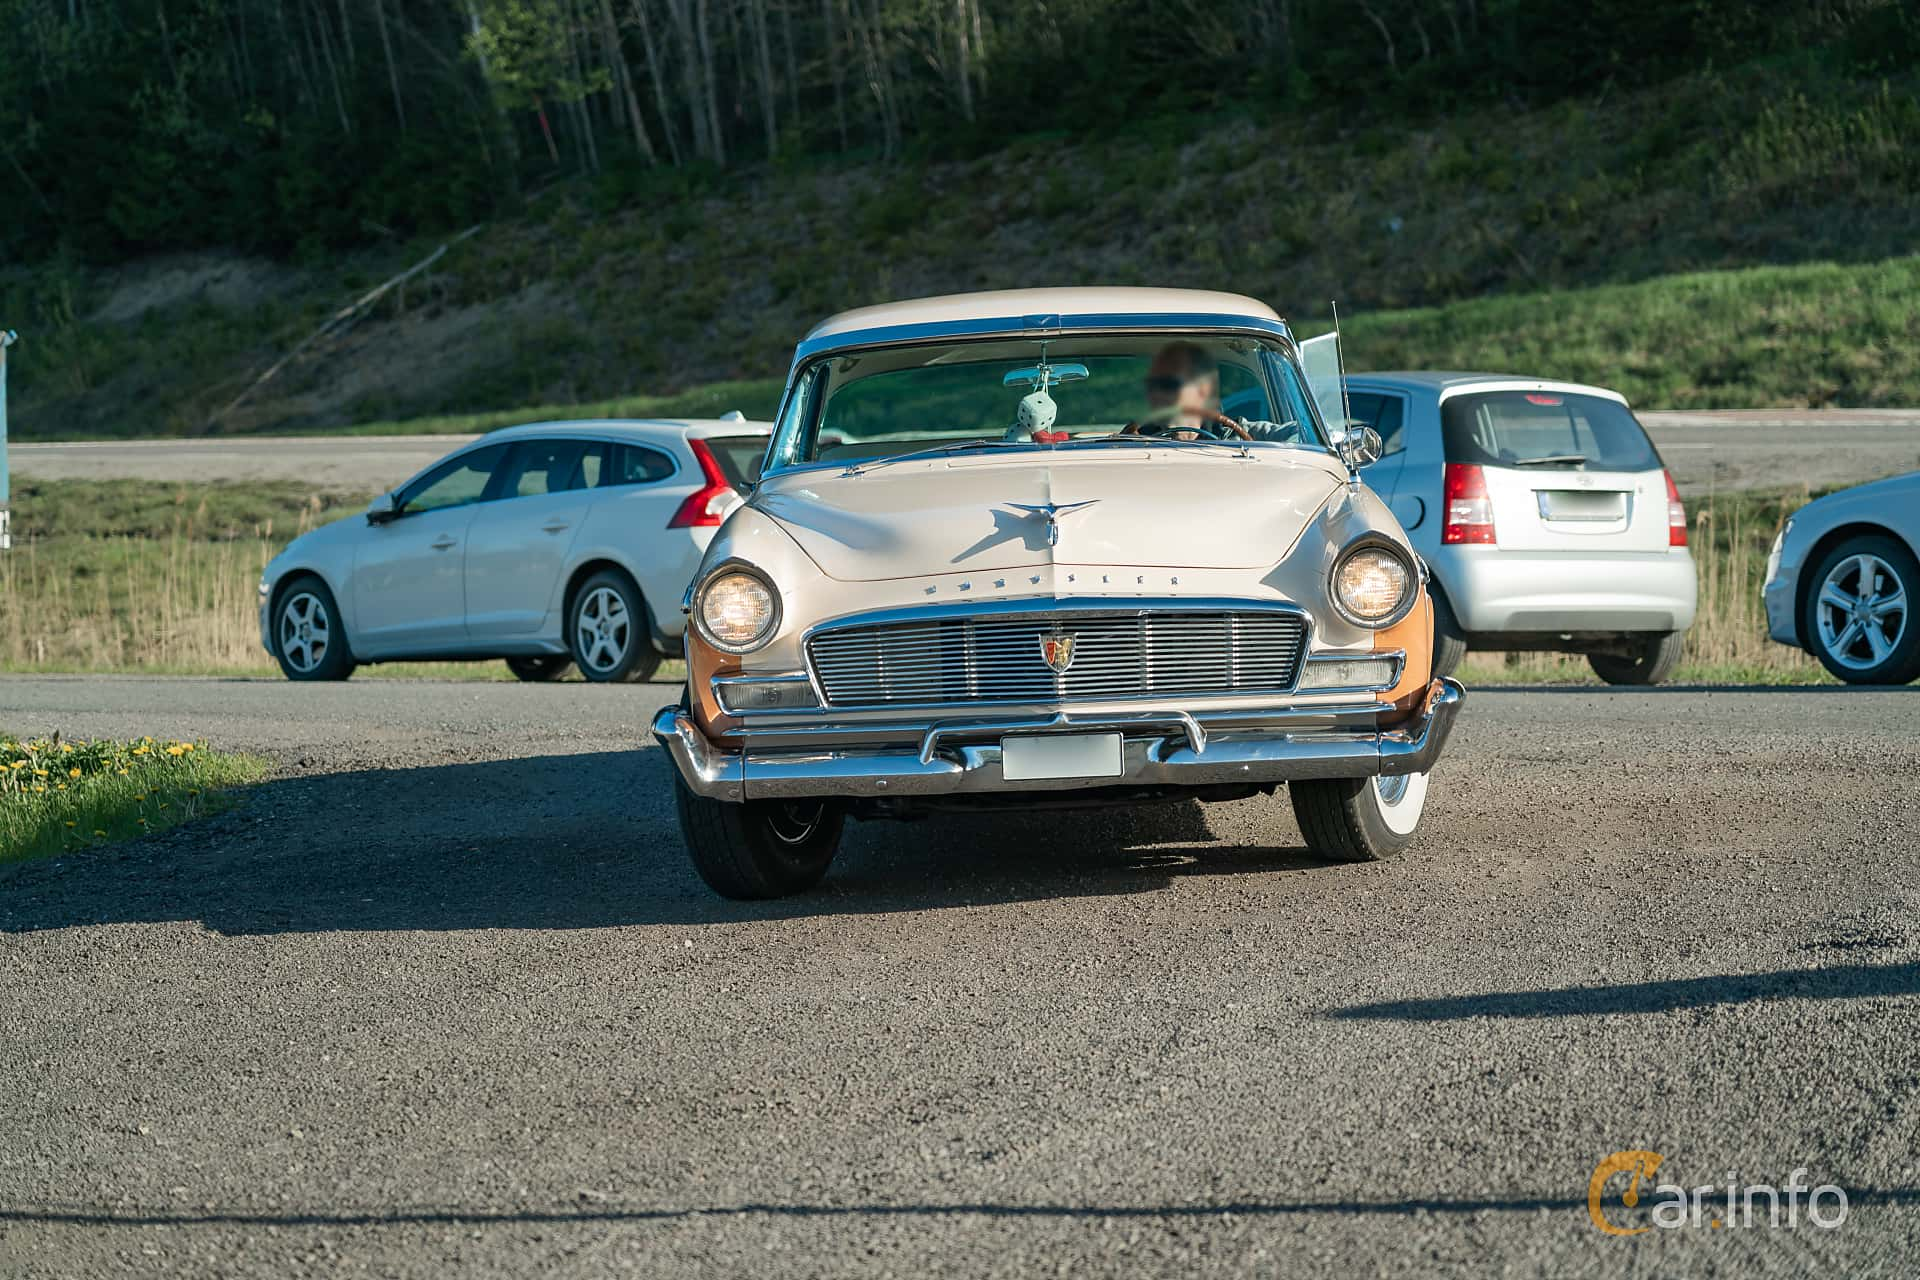 Chrysler New Yorker Newport 4-door 5.8 V8 PowerFlite, 284hk, 1956 at Lissma Classic Car 2019 vecka 20